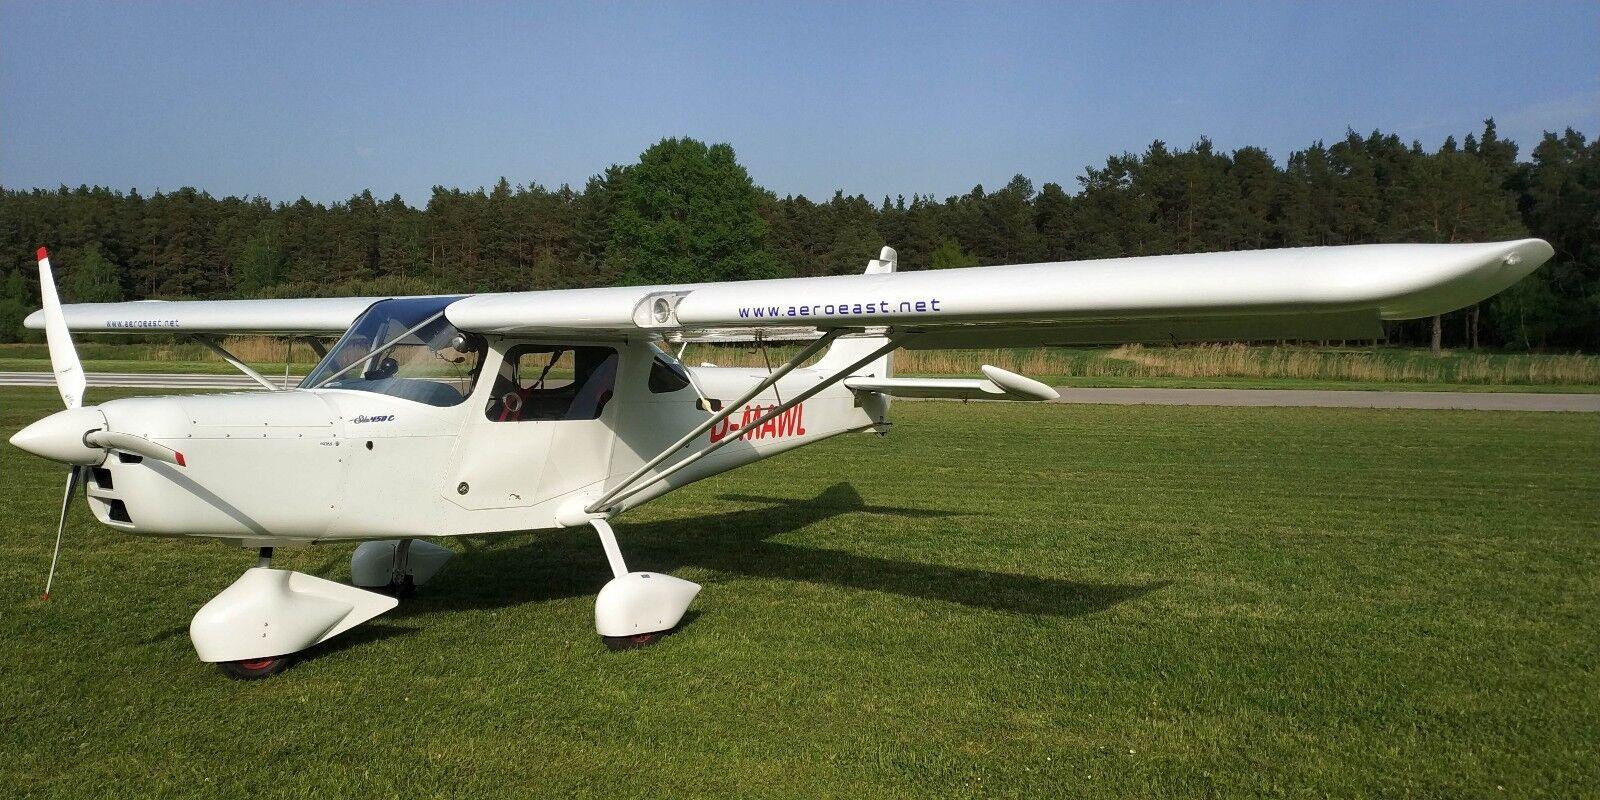 Ultraleichtflugzeug Sila 450 C mit Rotax 912 ULS Bj.2016